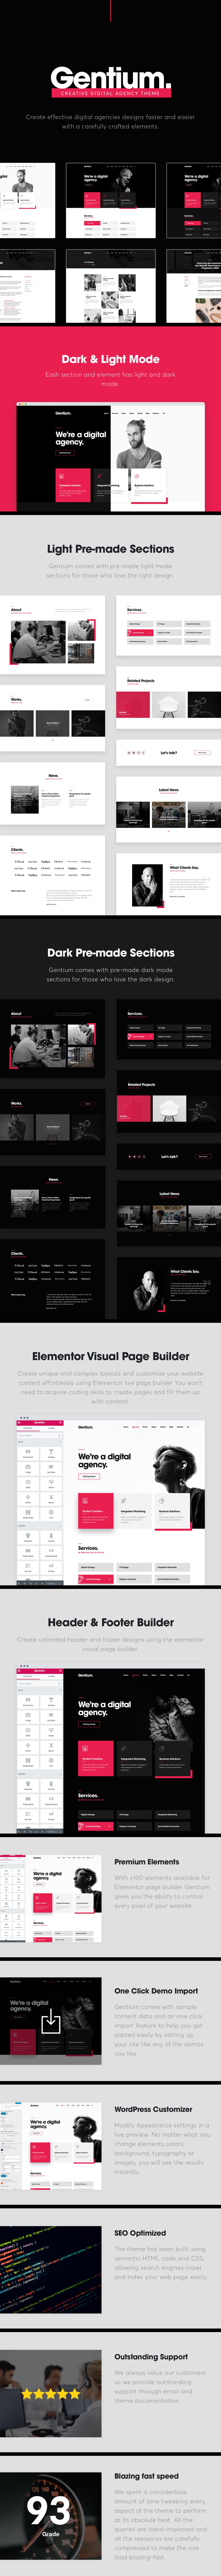 Gentium – A Creative Digital Agency WordPress Theme - 3